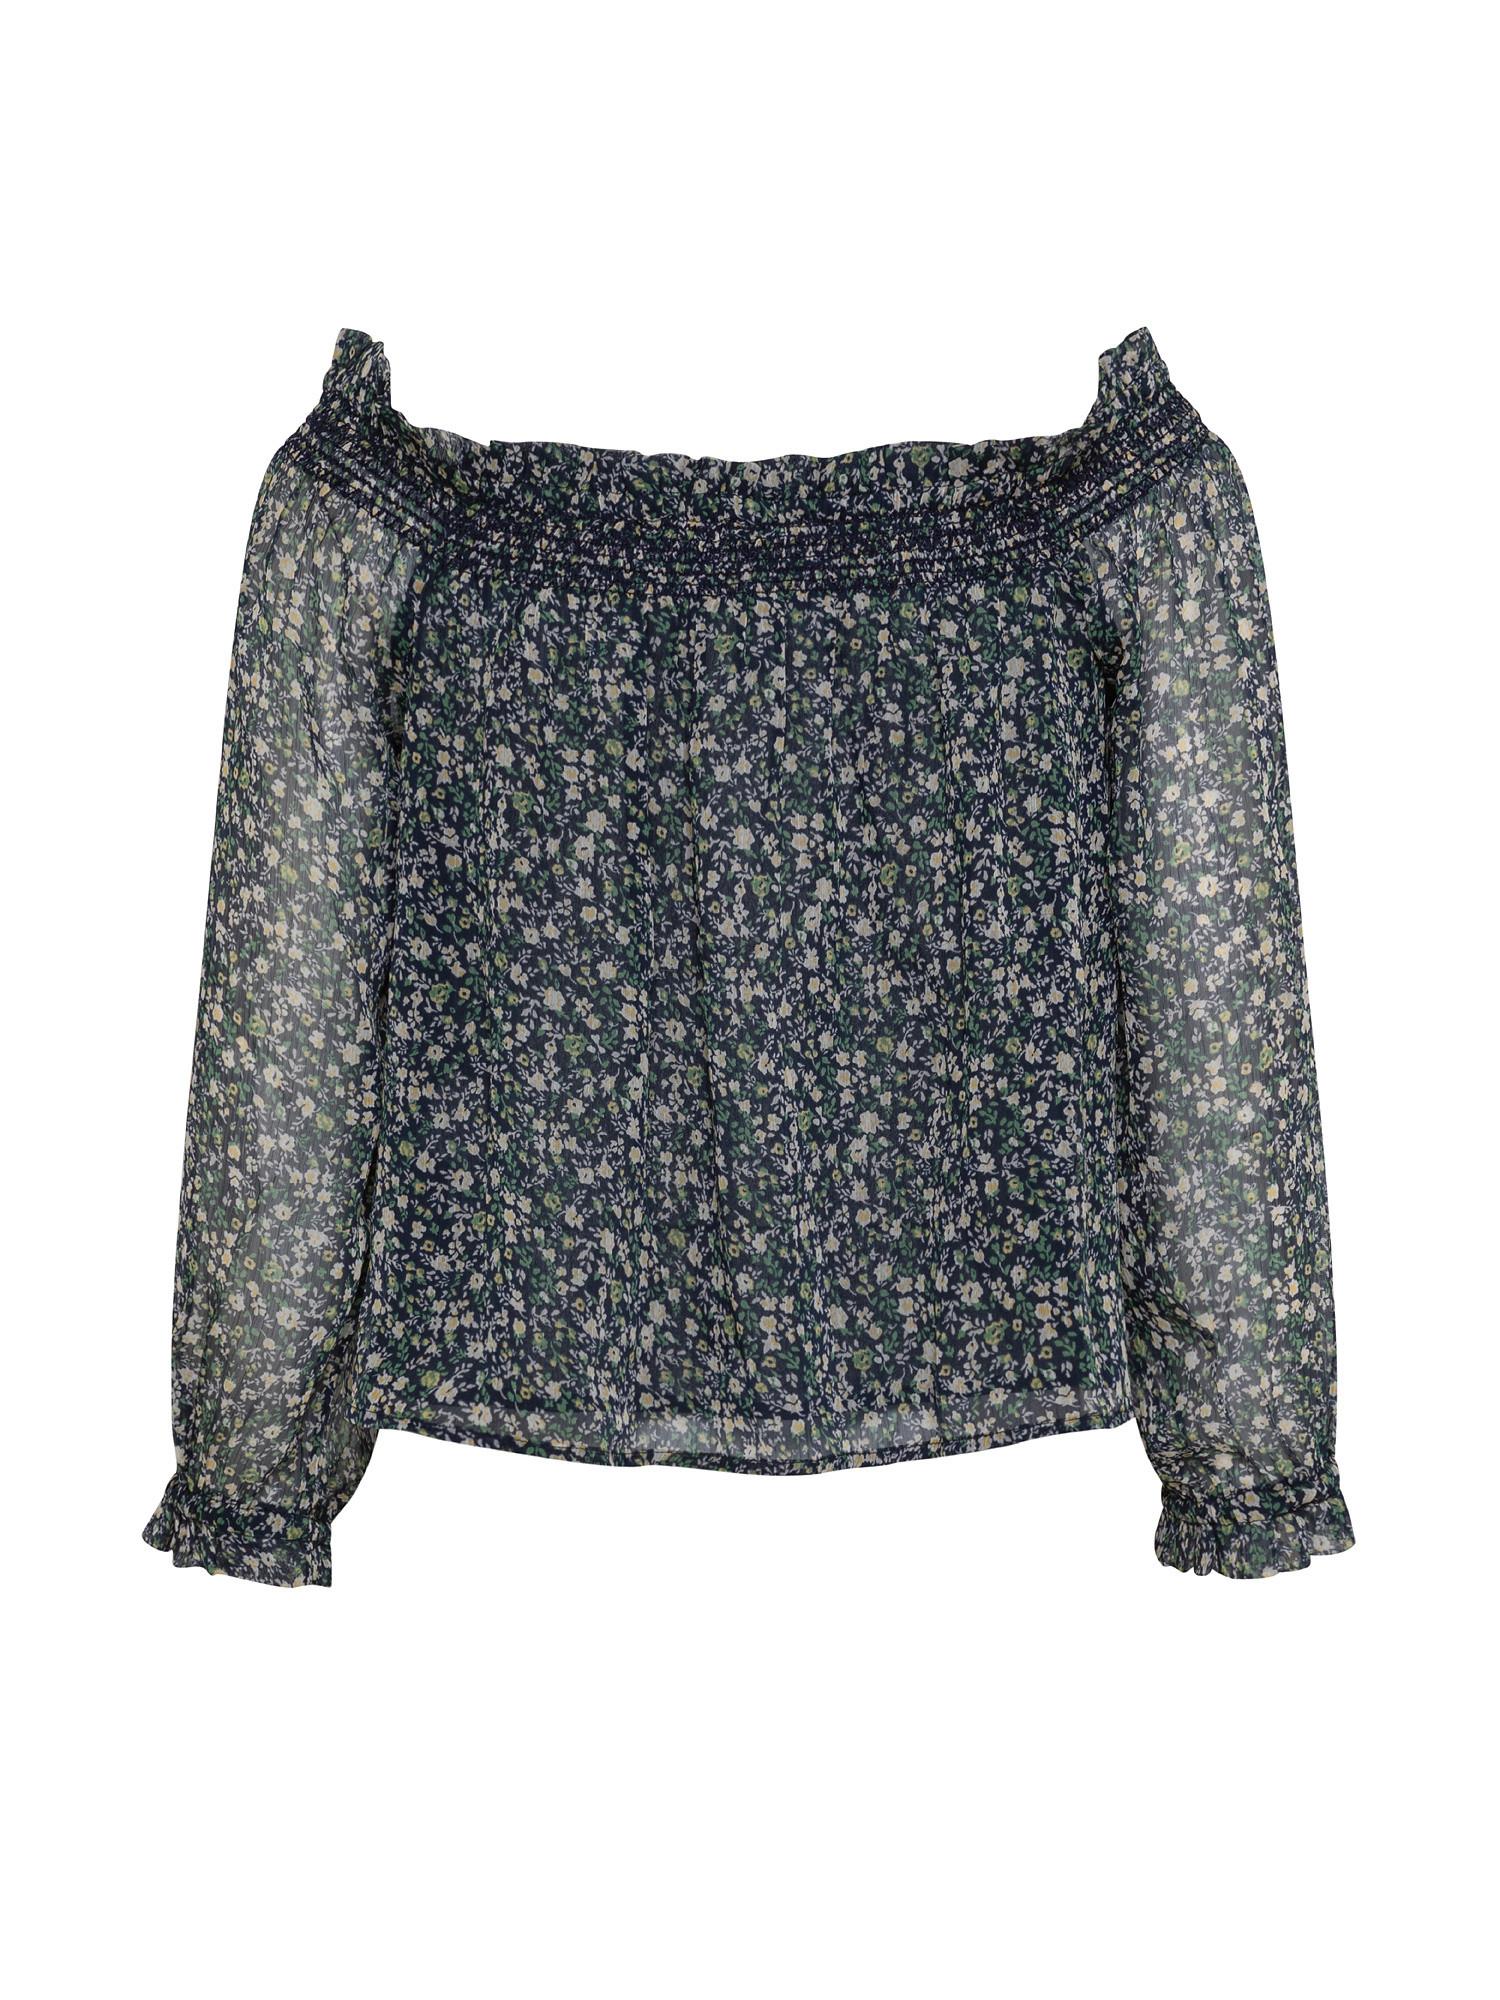 Blusa senza spalle Louise, Multicolor, large image number 1